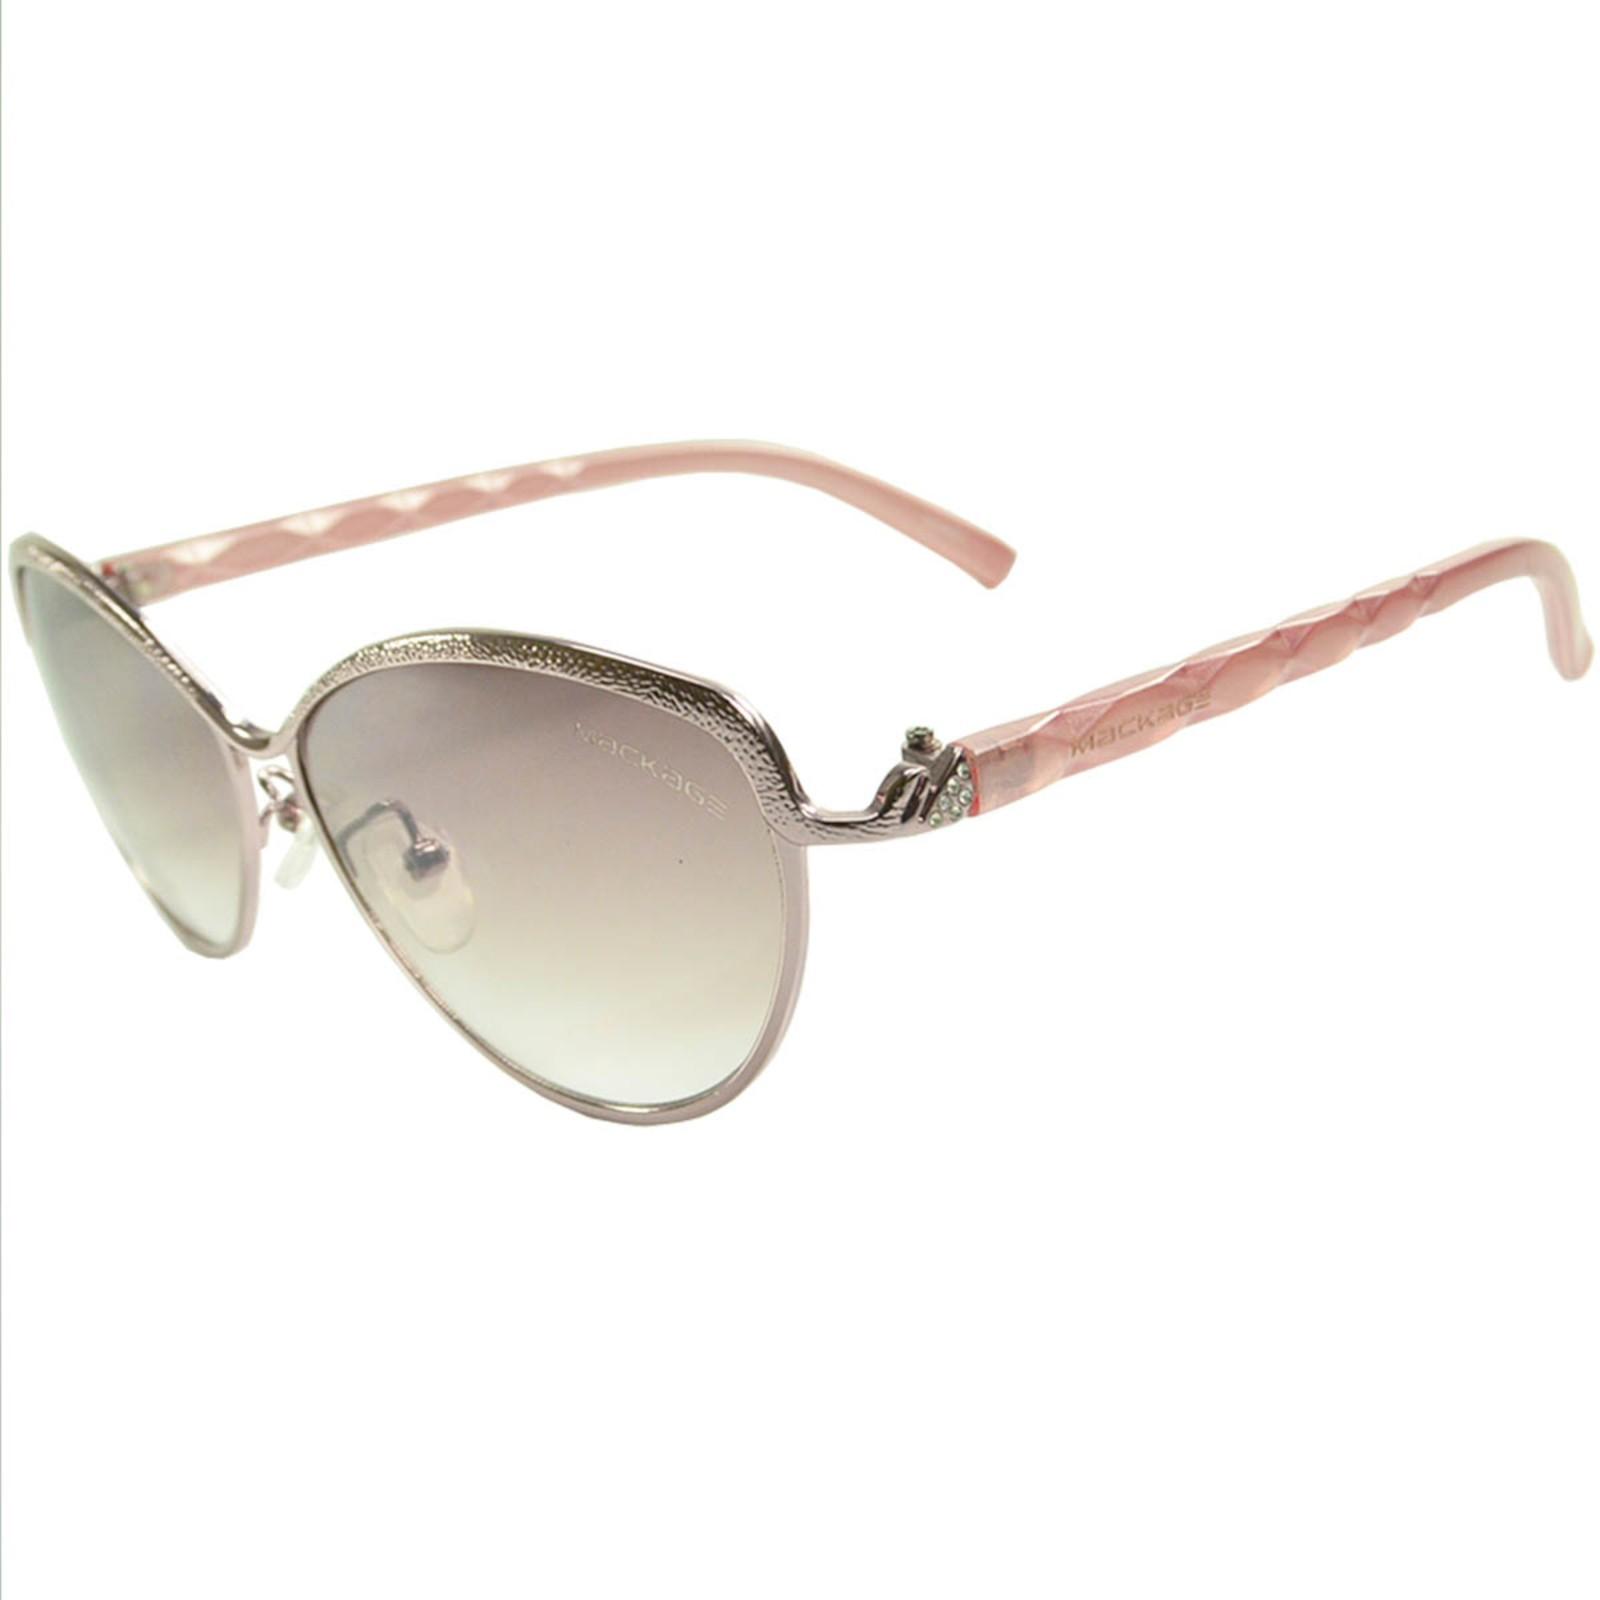 Óculos de Sol Mackage Feminino Metal/Acetato Gateado - Prata/Rosa